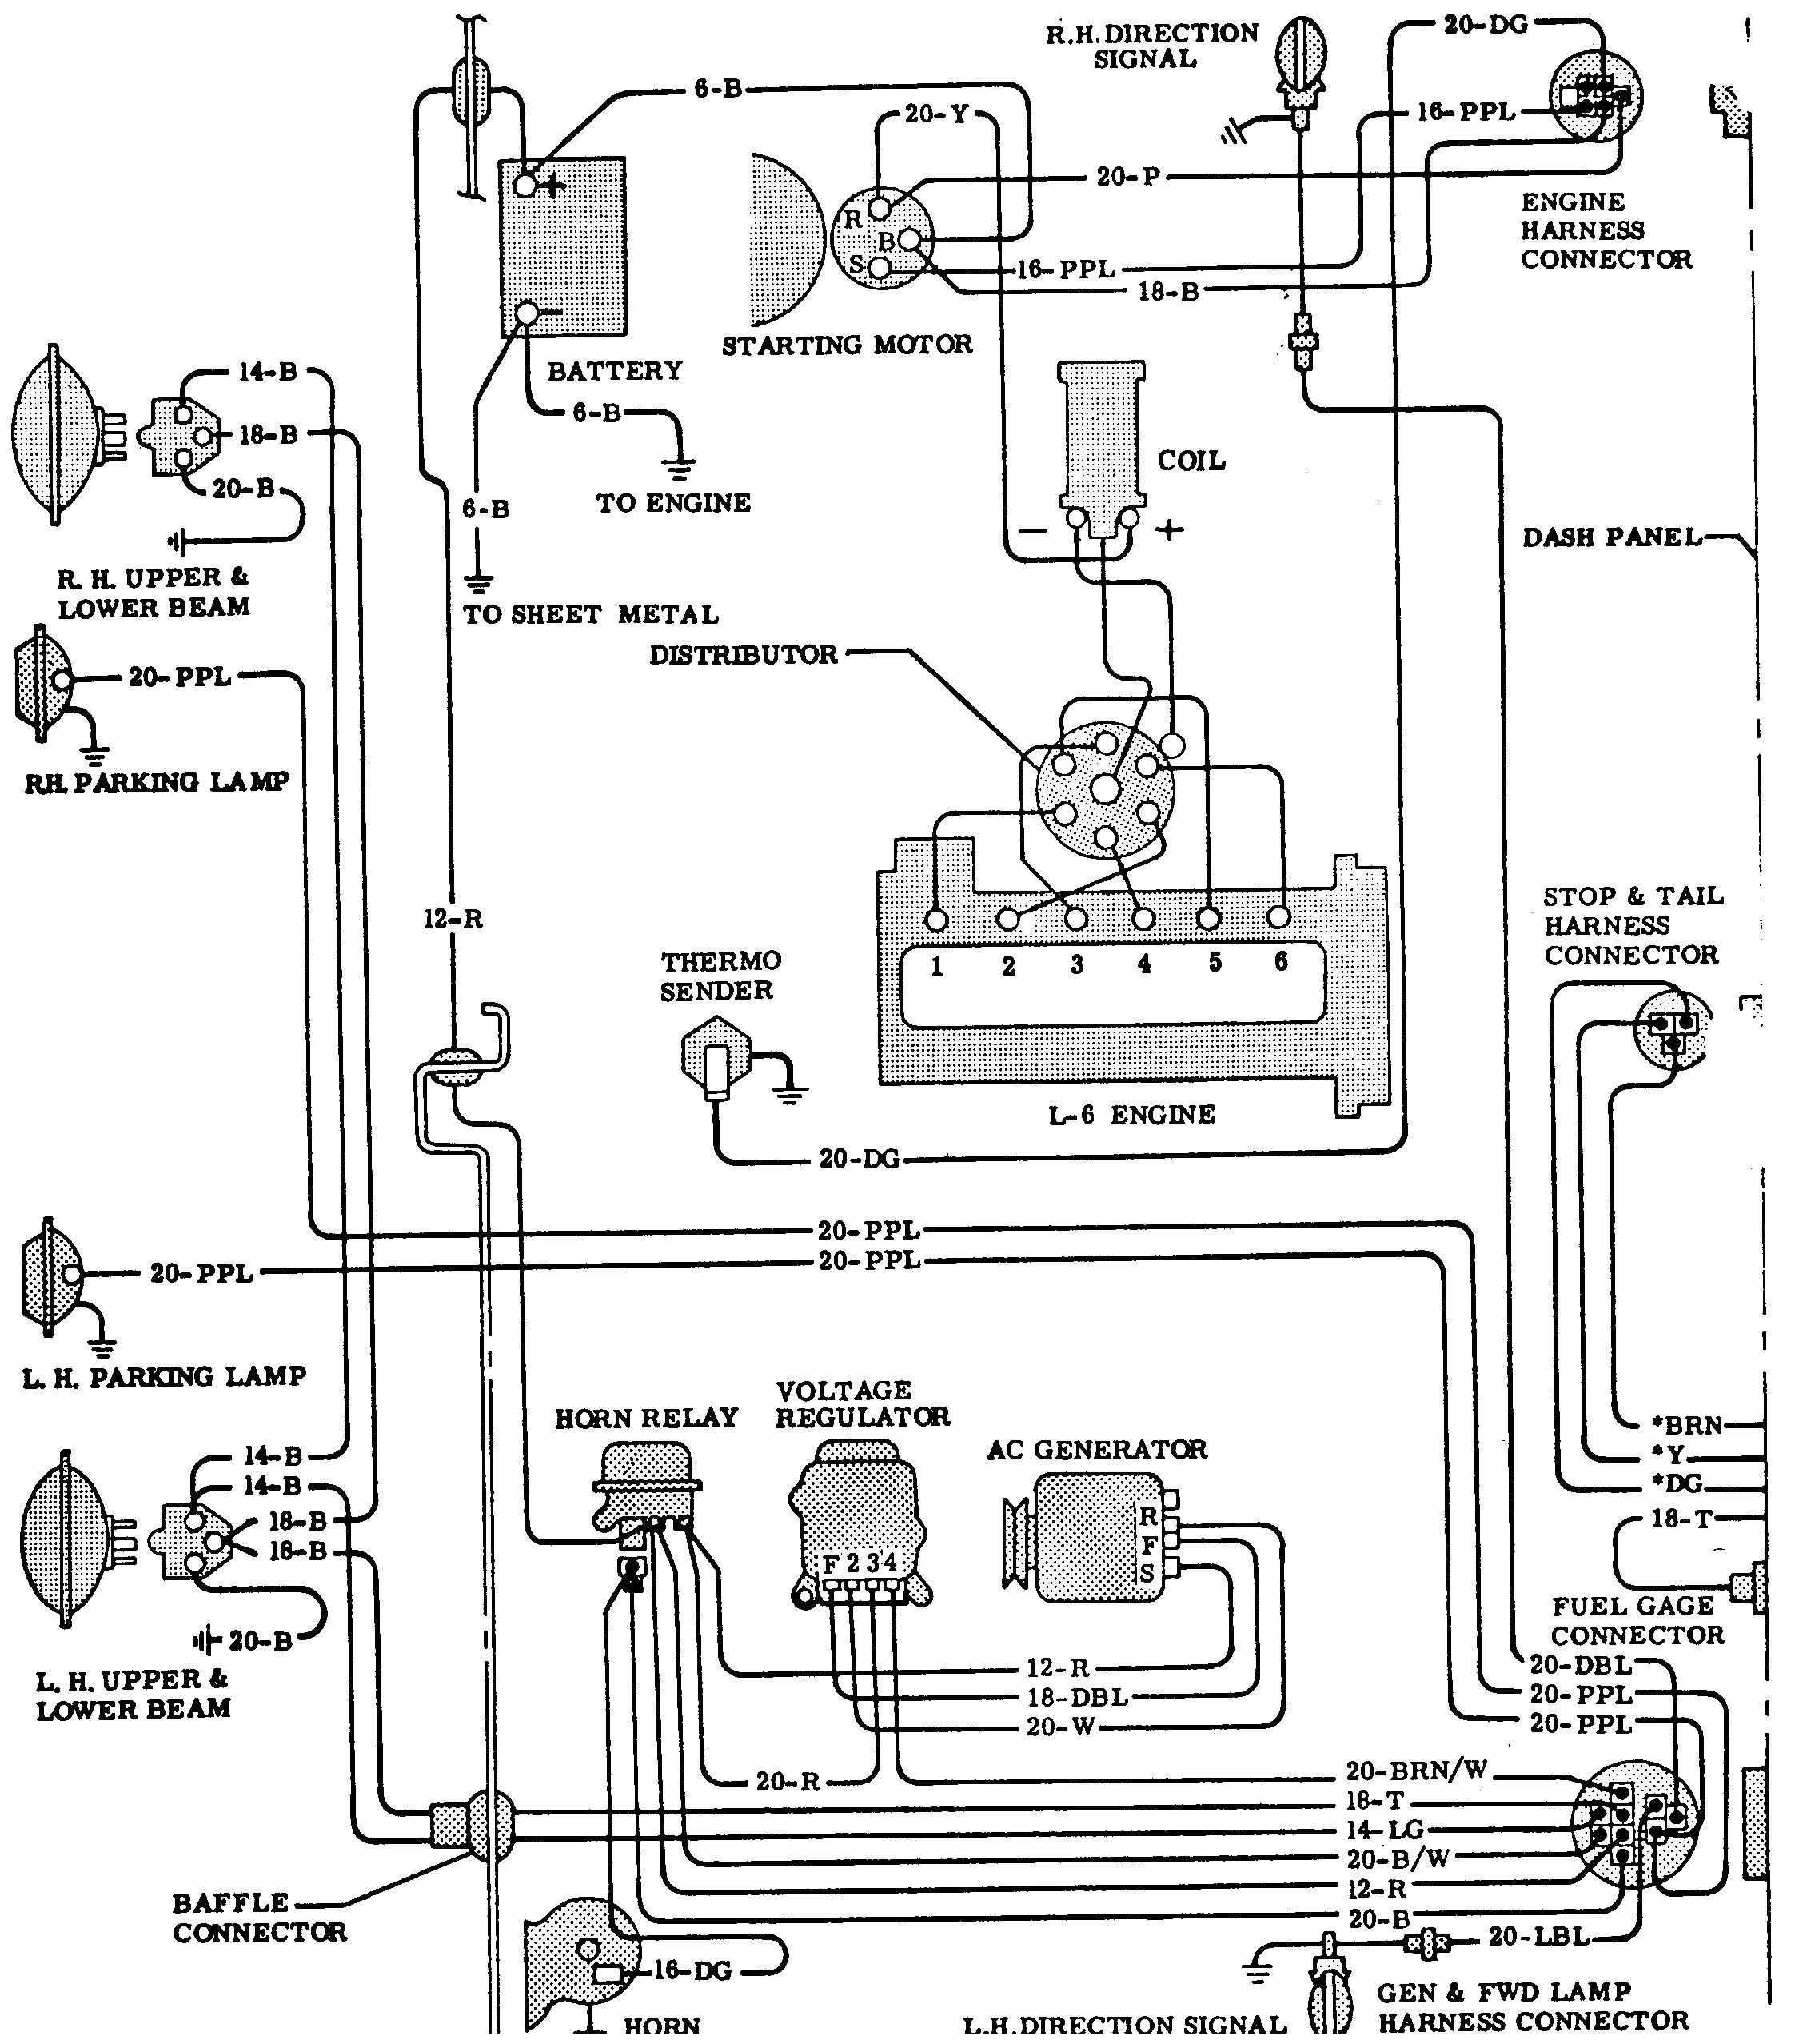 chevrolet truck parts diagram 78 chevy starter diagram